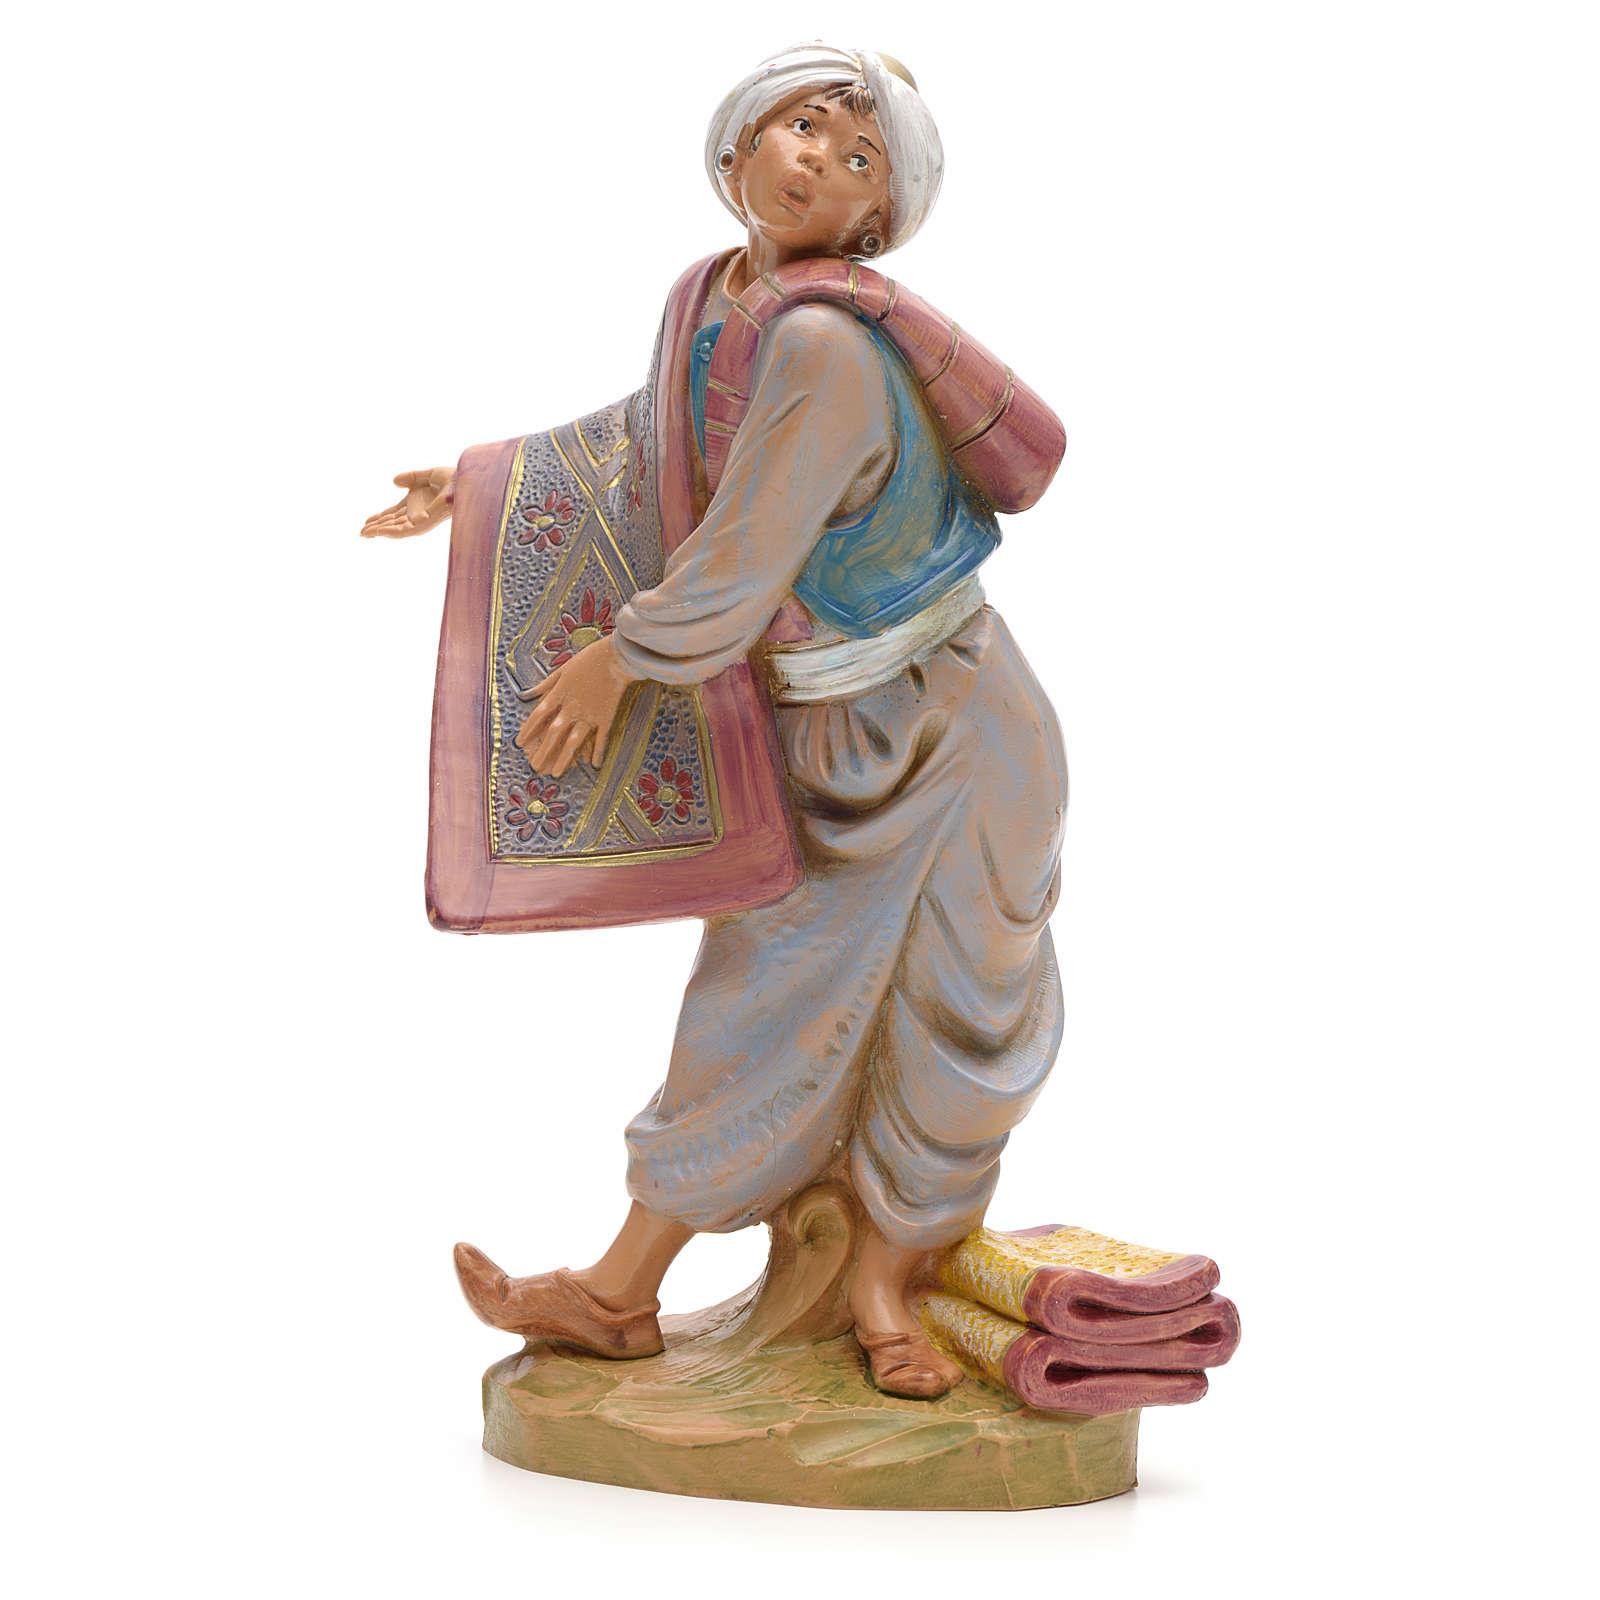 Vendedor de tapetes presépio 19 cm Fontanini 3